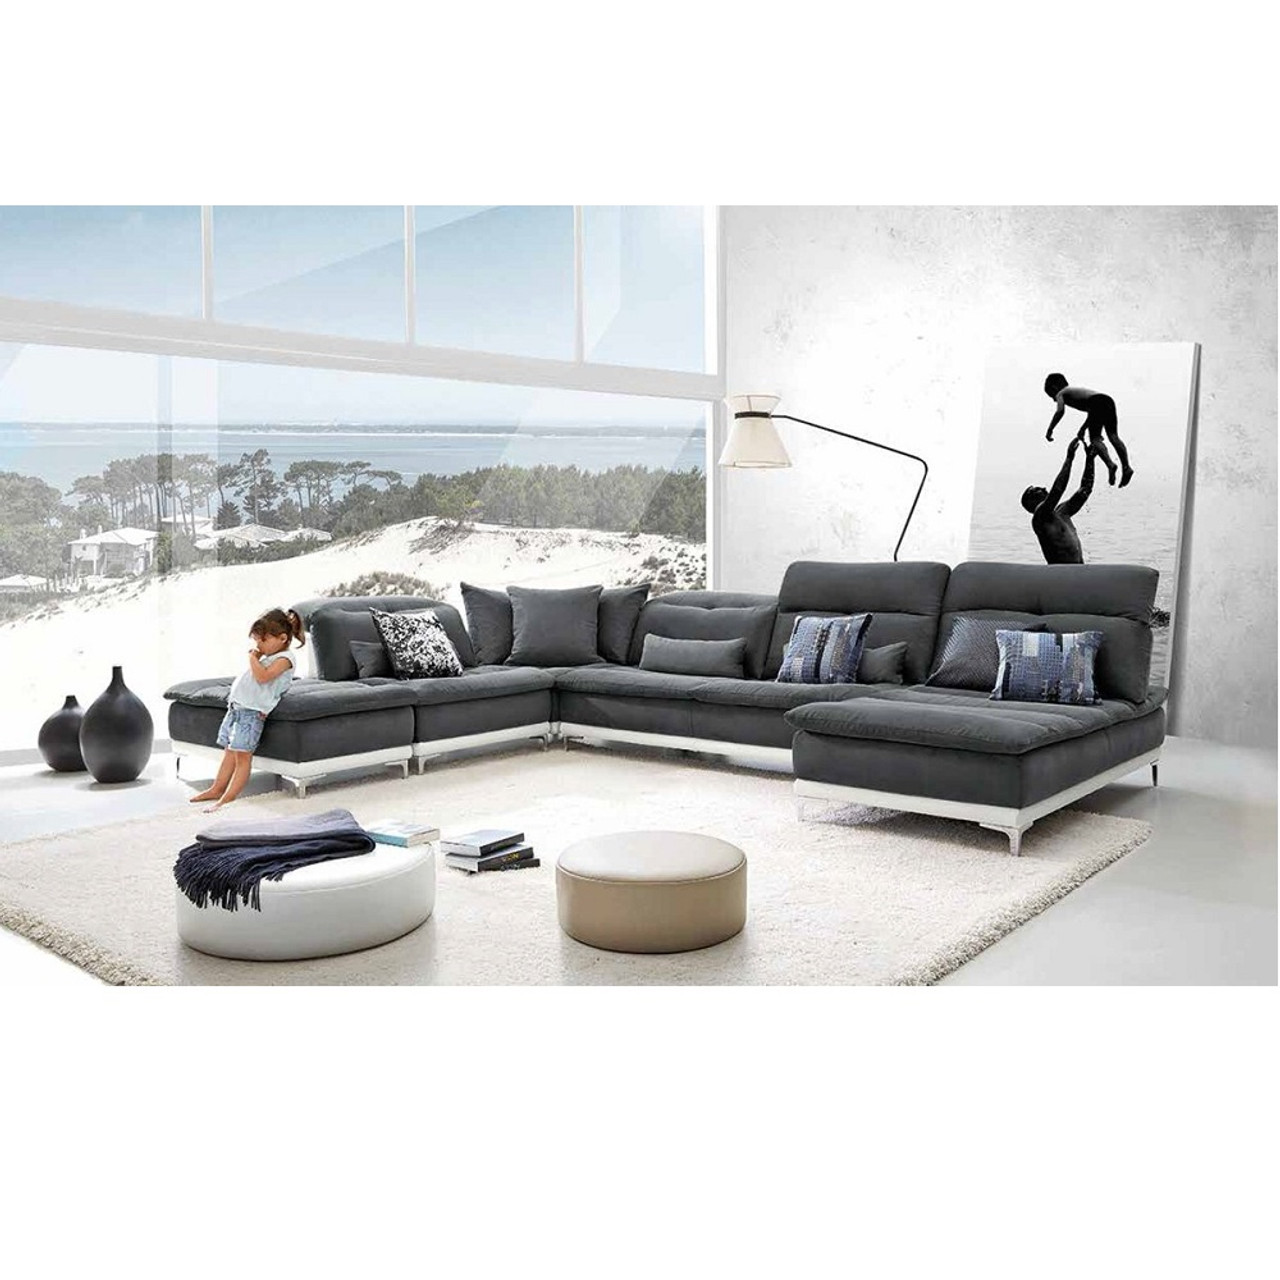 David Ferrari Horizon Modern Grey Fabric Leather Sectional Sofa